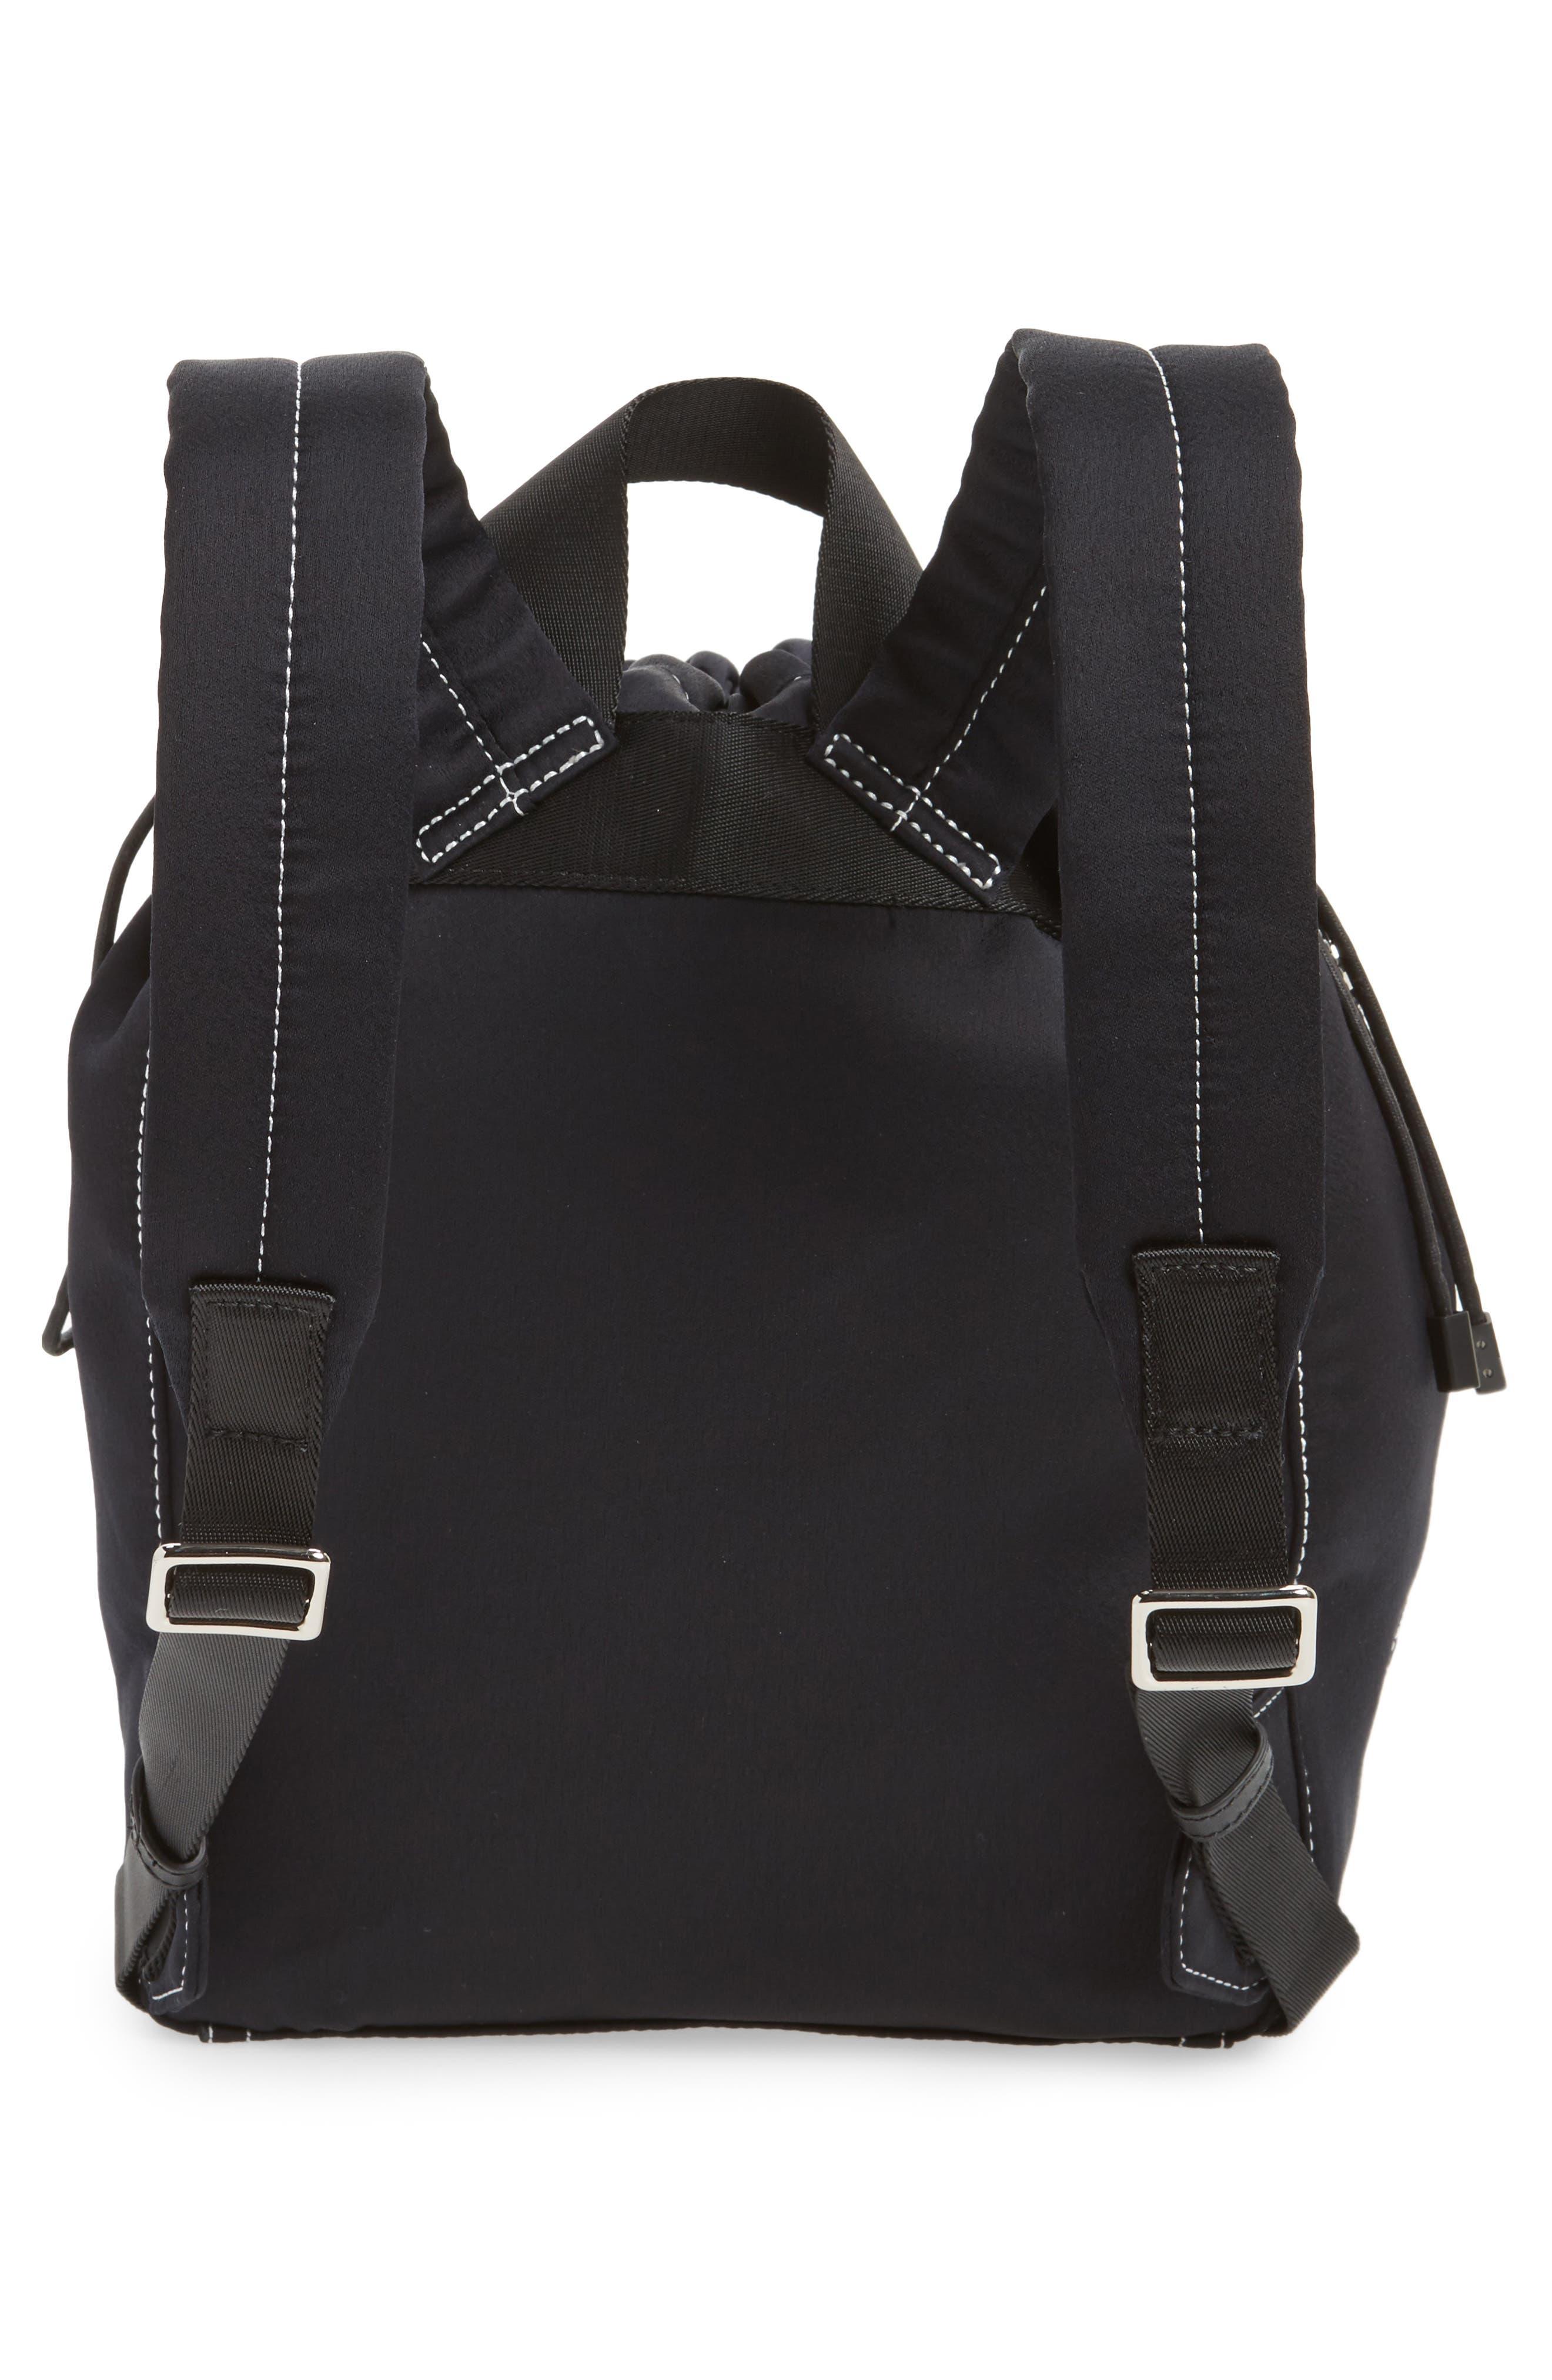 Alternate Image 3  - Phillip Lim 3.1 Medium Go-Go Lace-Up Backpack